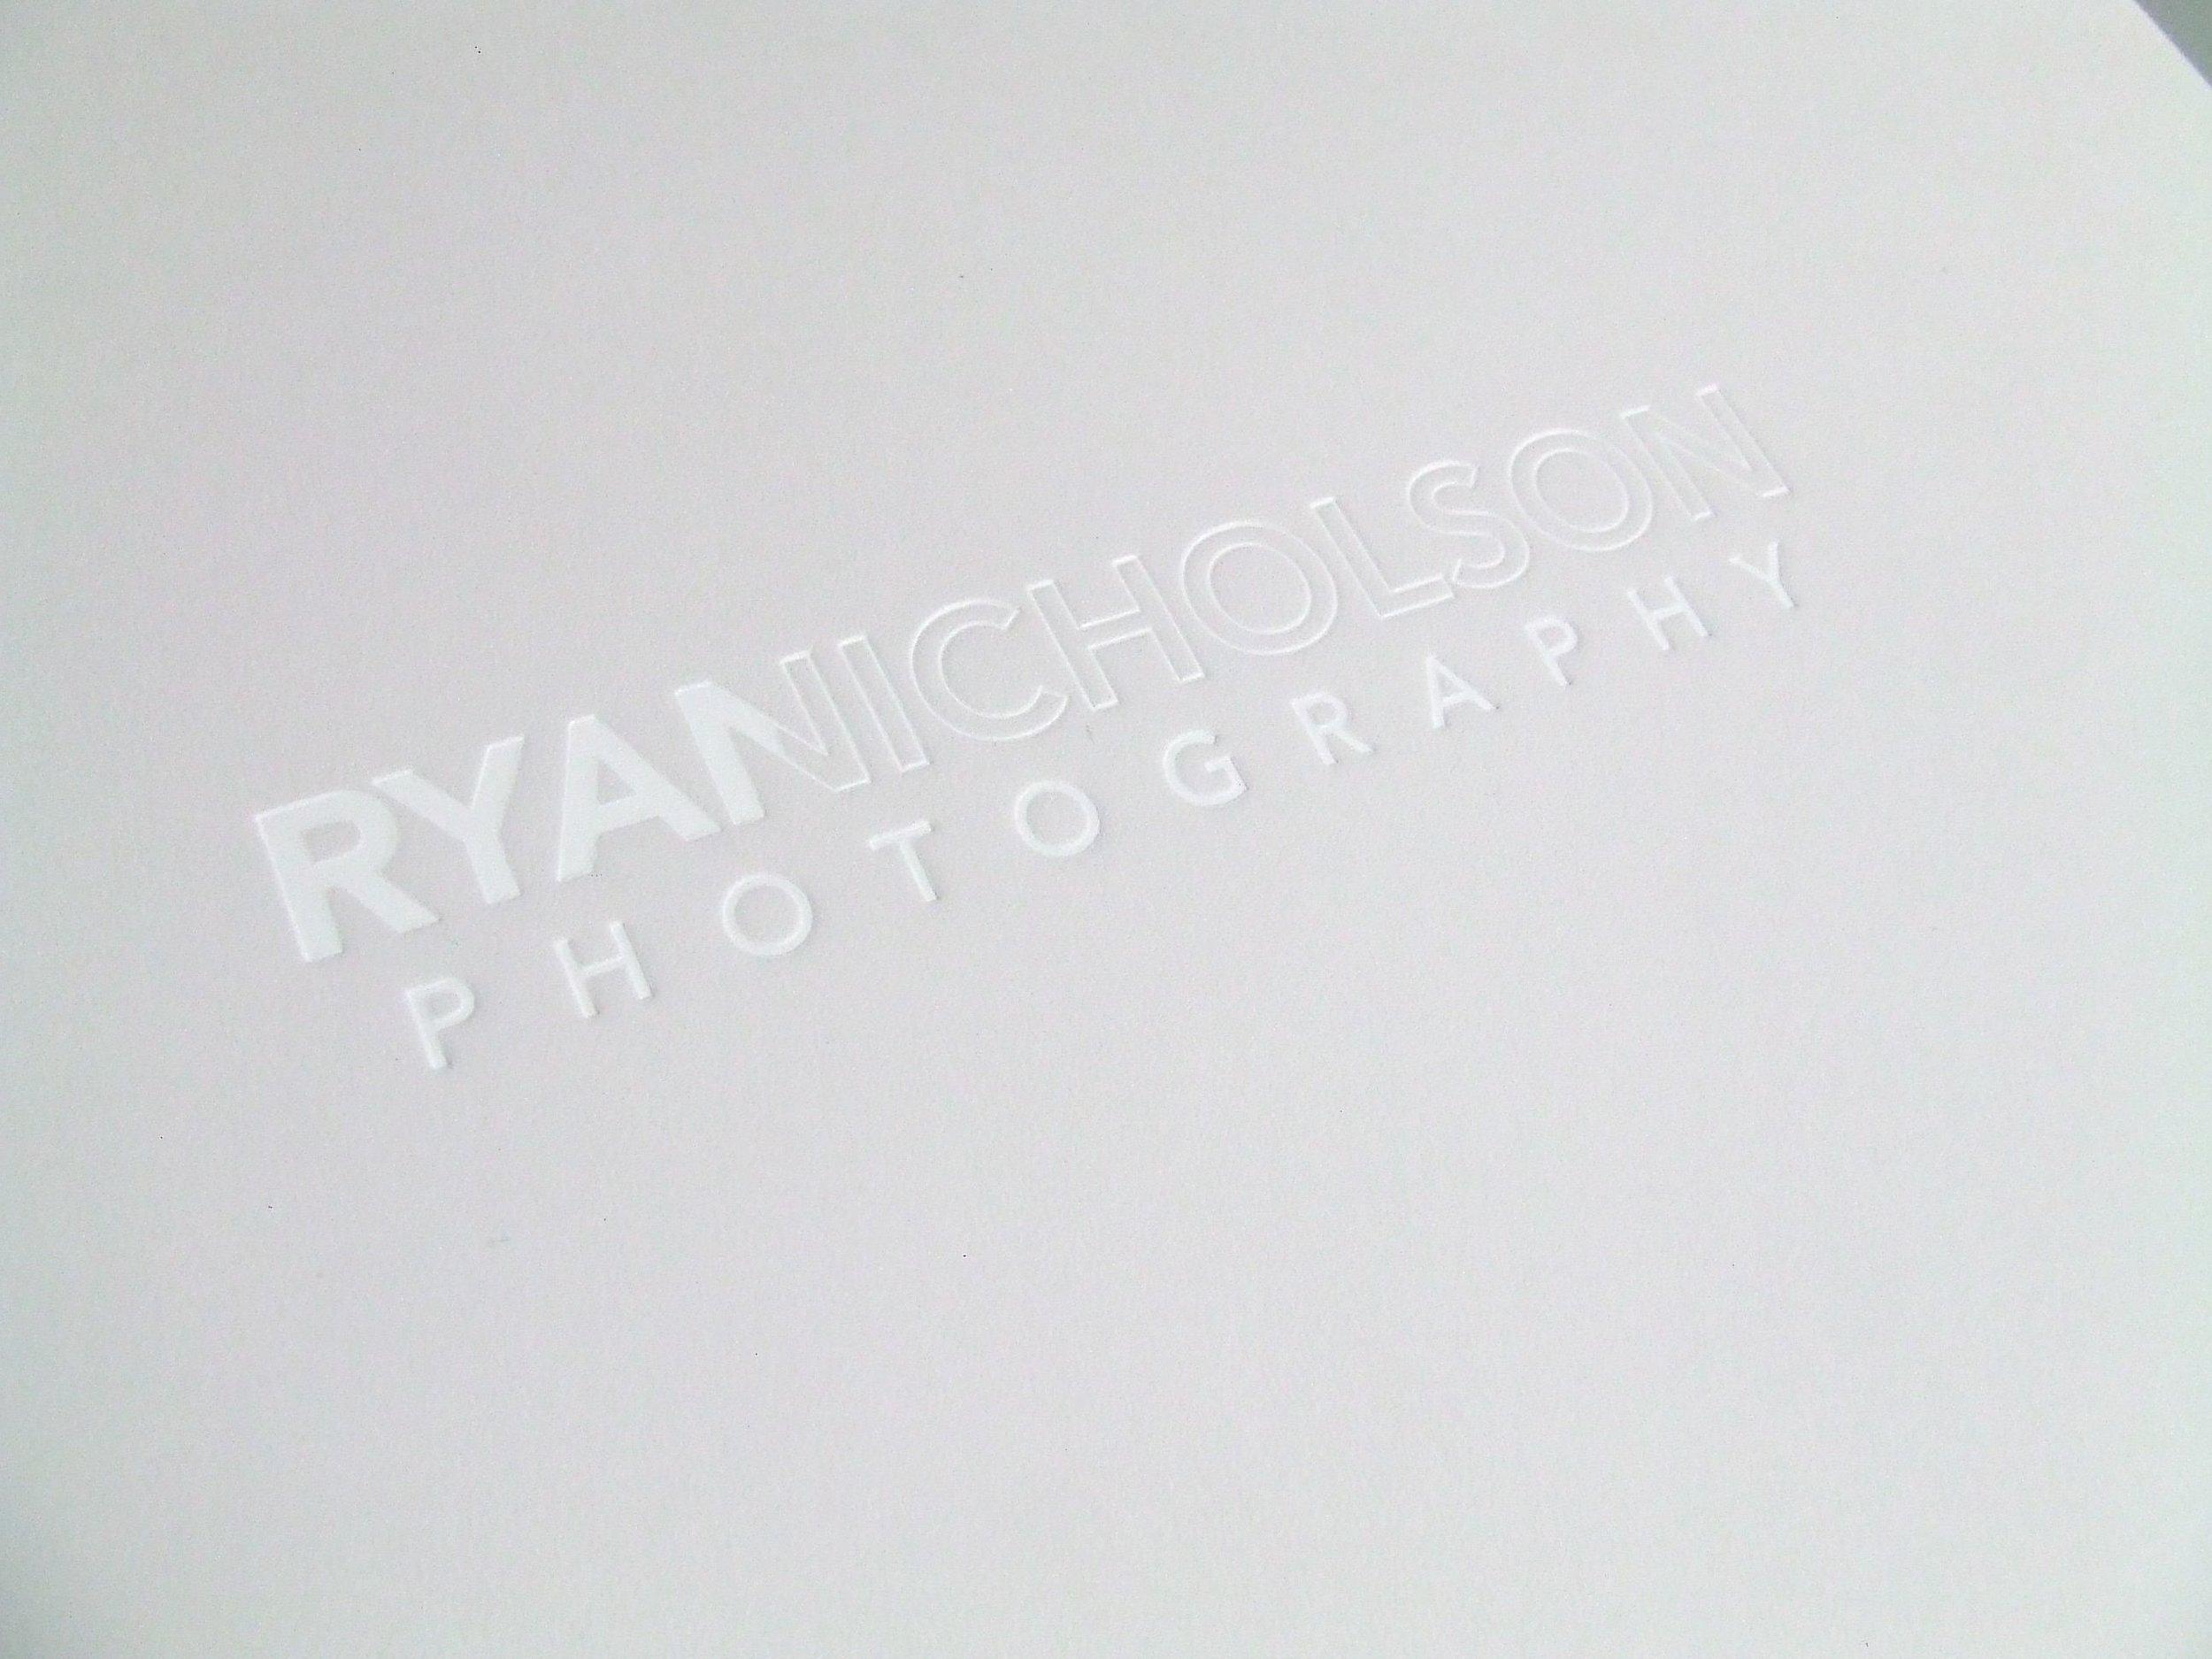 nicholson-3.jpg